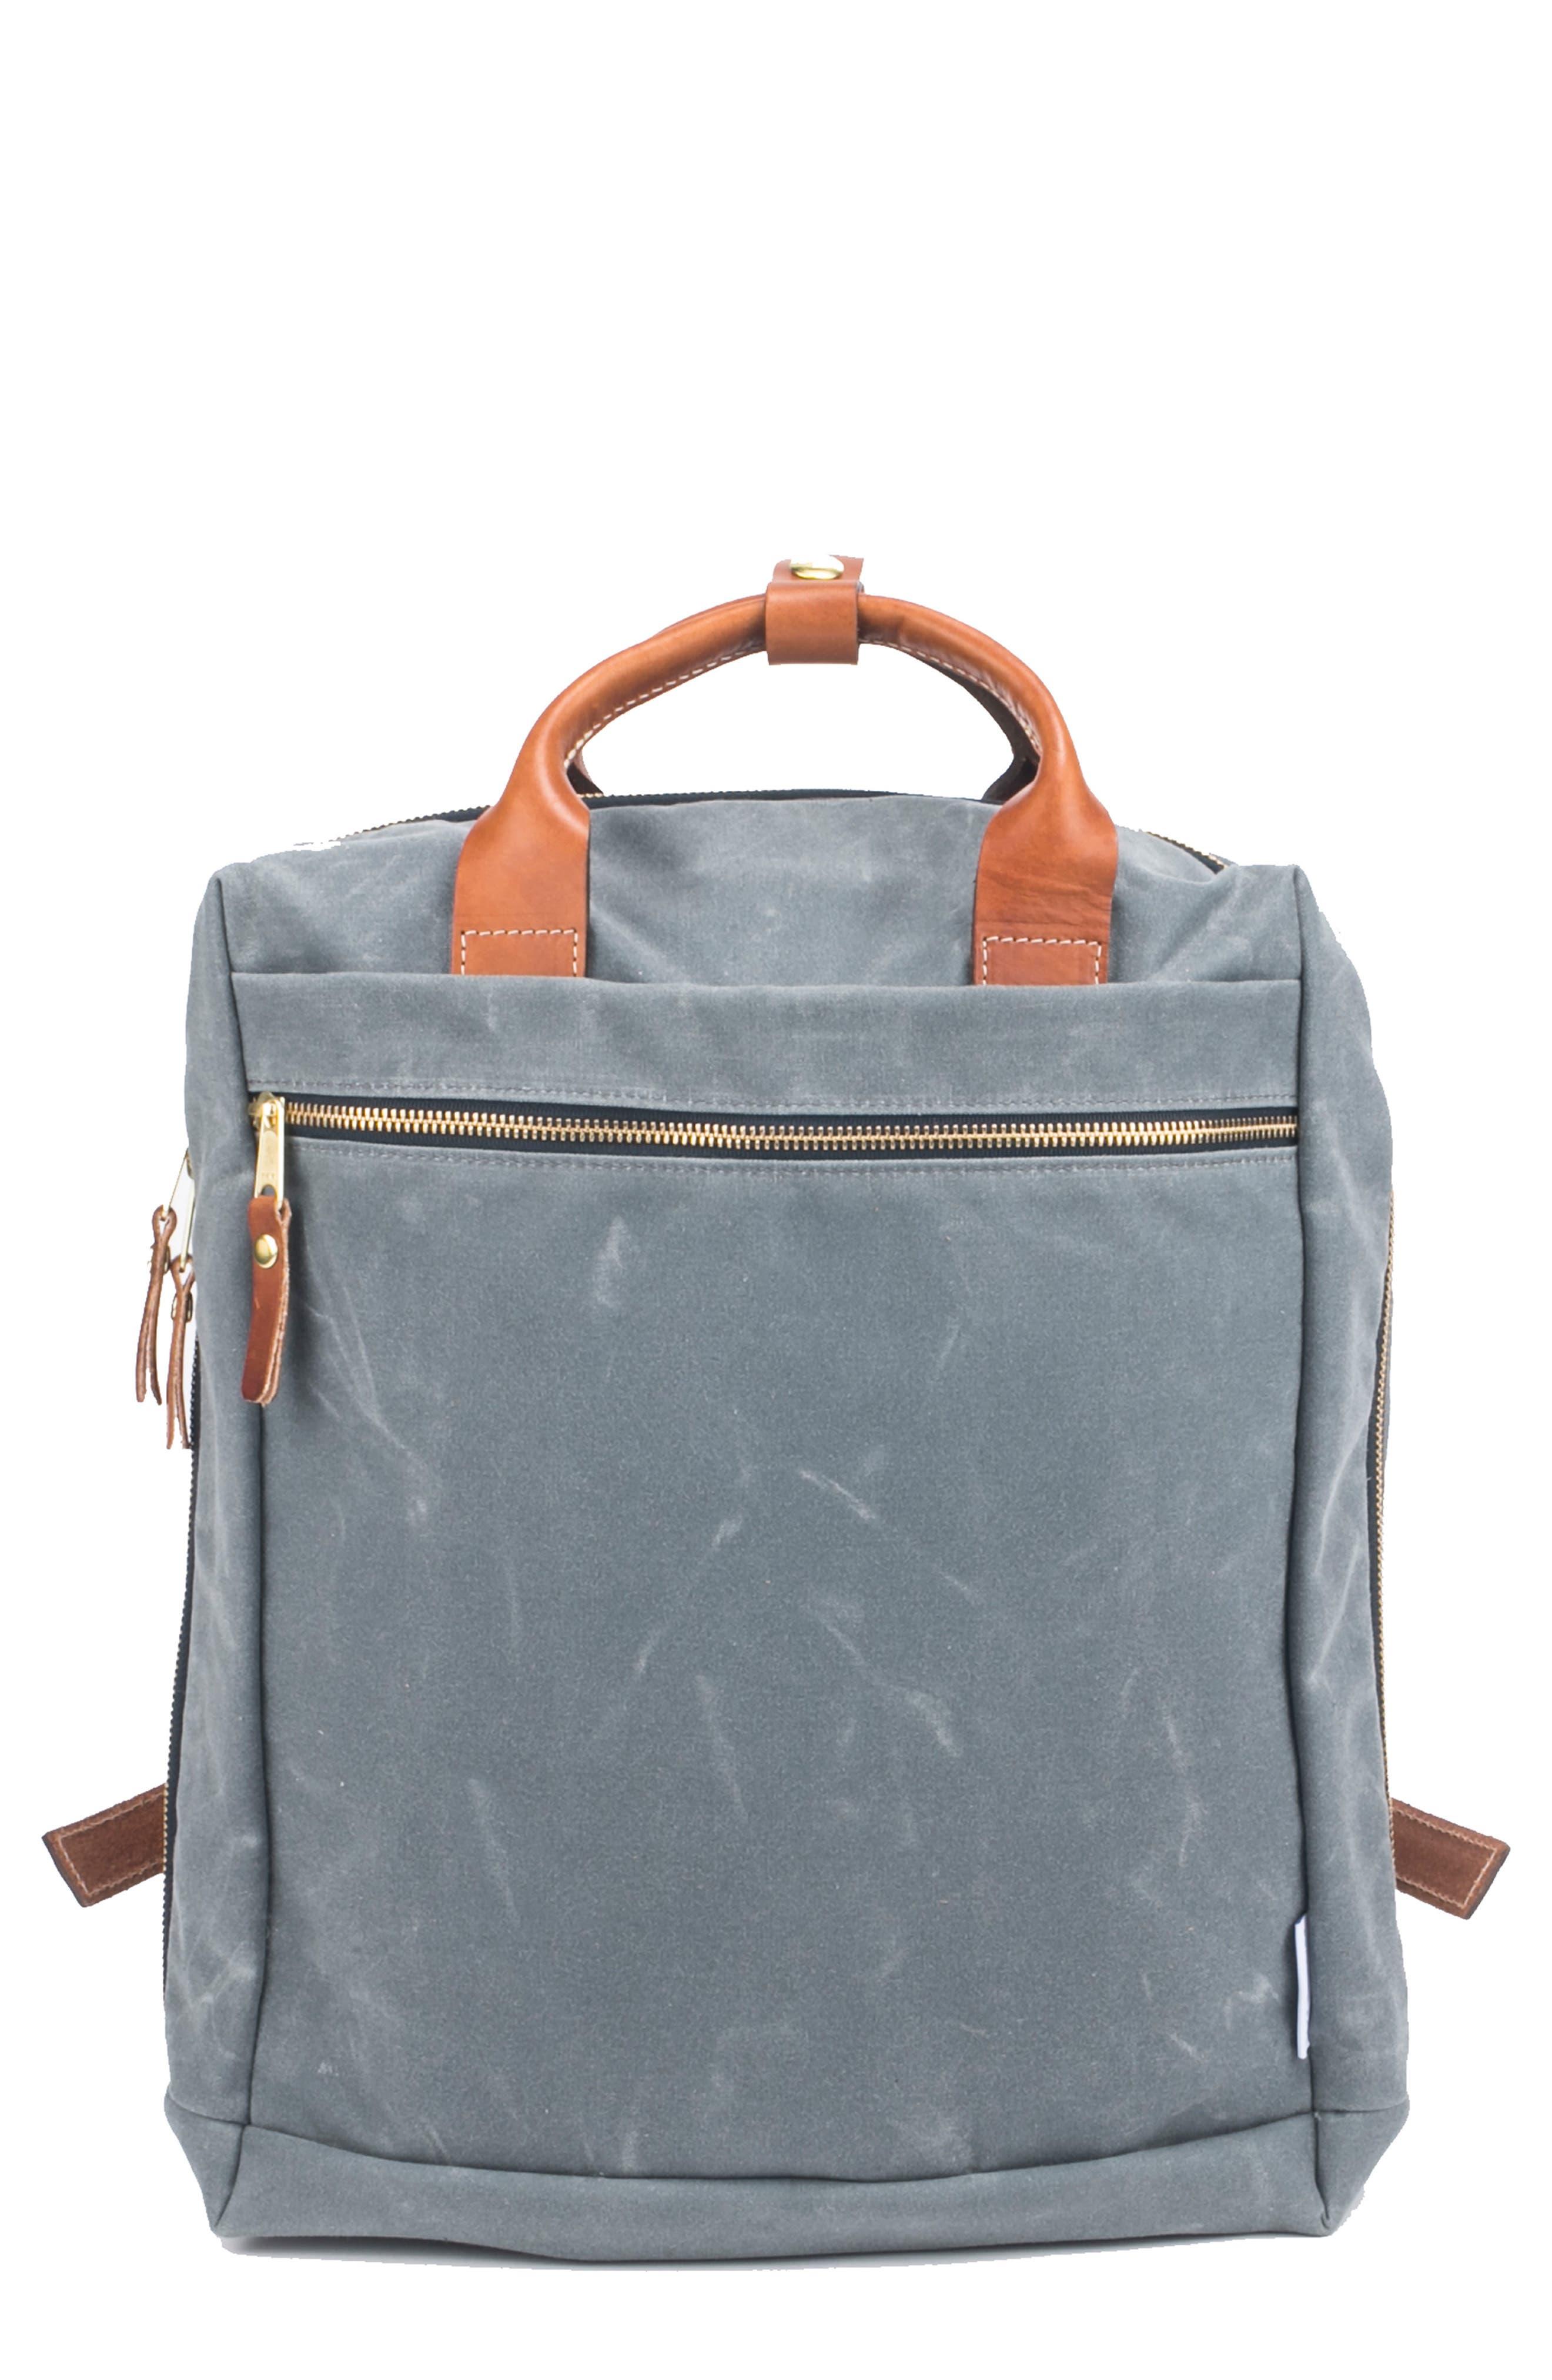 Metro Backpack,                             Main thumbnail 1, color,                             CHARCOAL